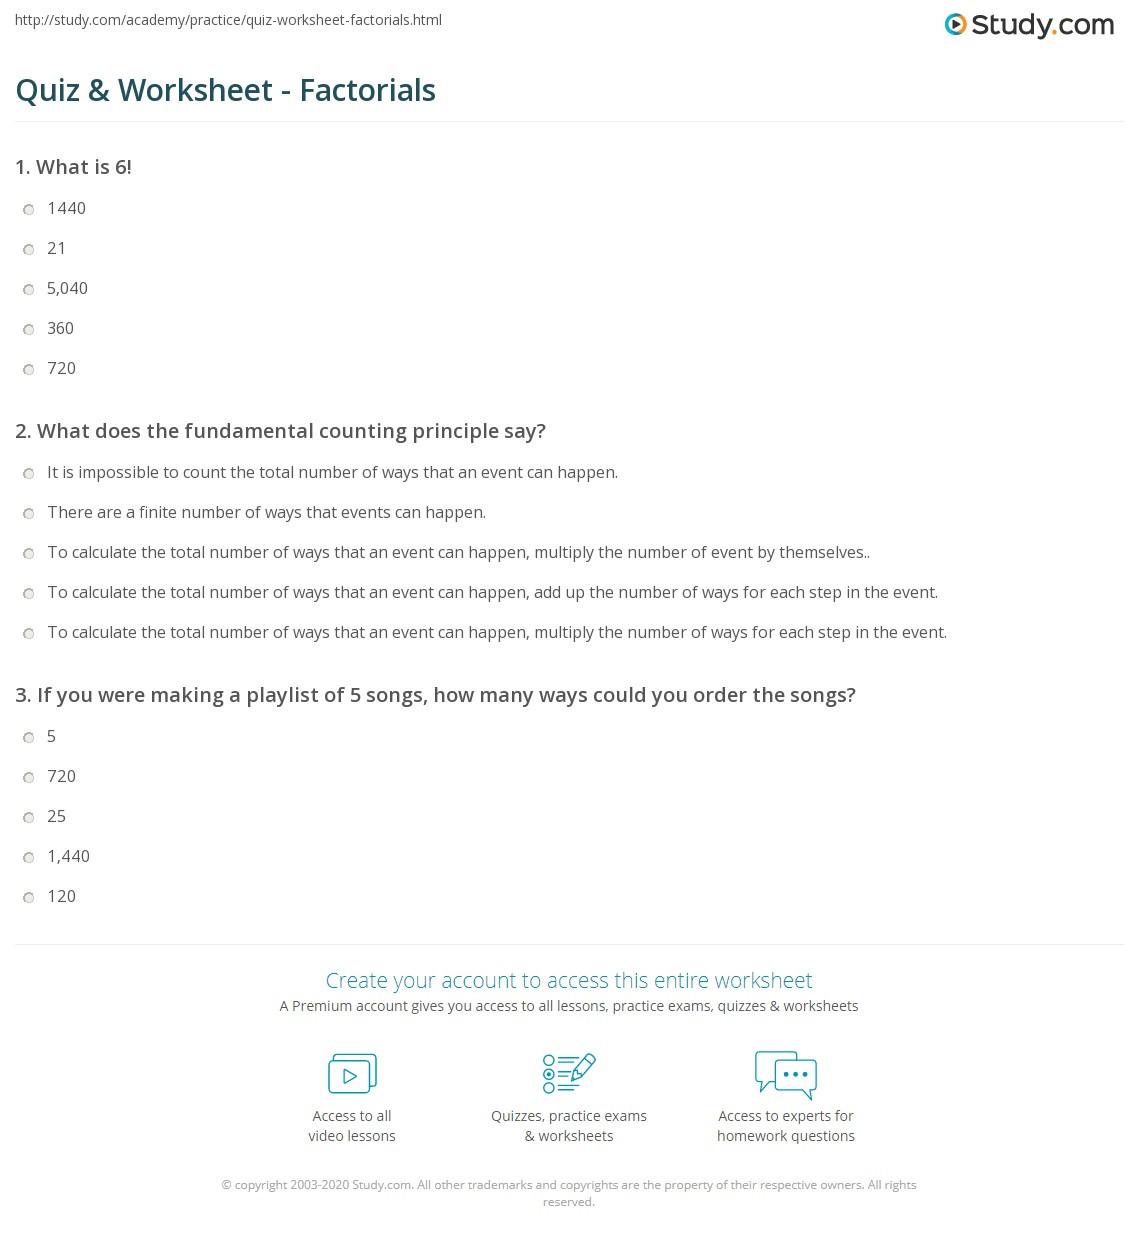 Fundamental Counting Principle Worksheet Quiz & Worksheet Factorials